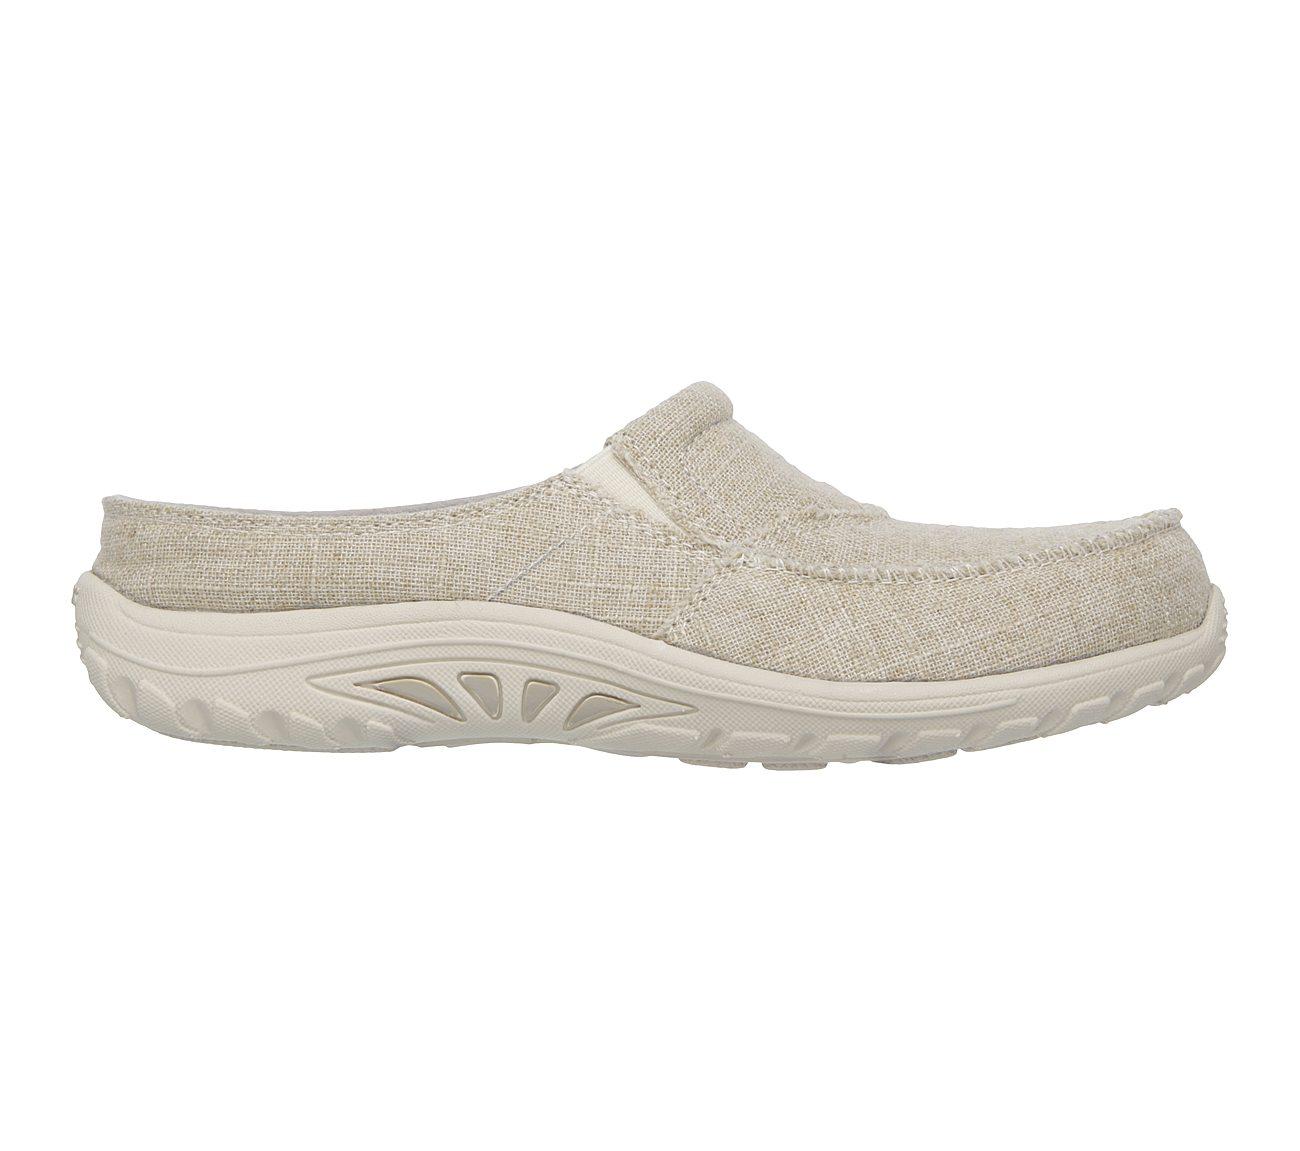 Buy SKECHERS Relaxed Fit  Reggae Fest - Deputy Modern Comfort Shoes ... 9f33b4bd5